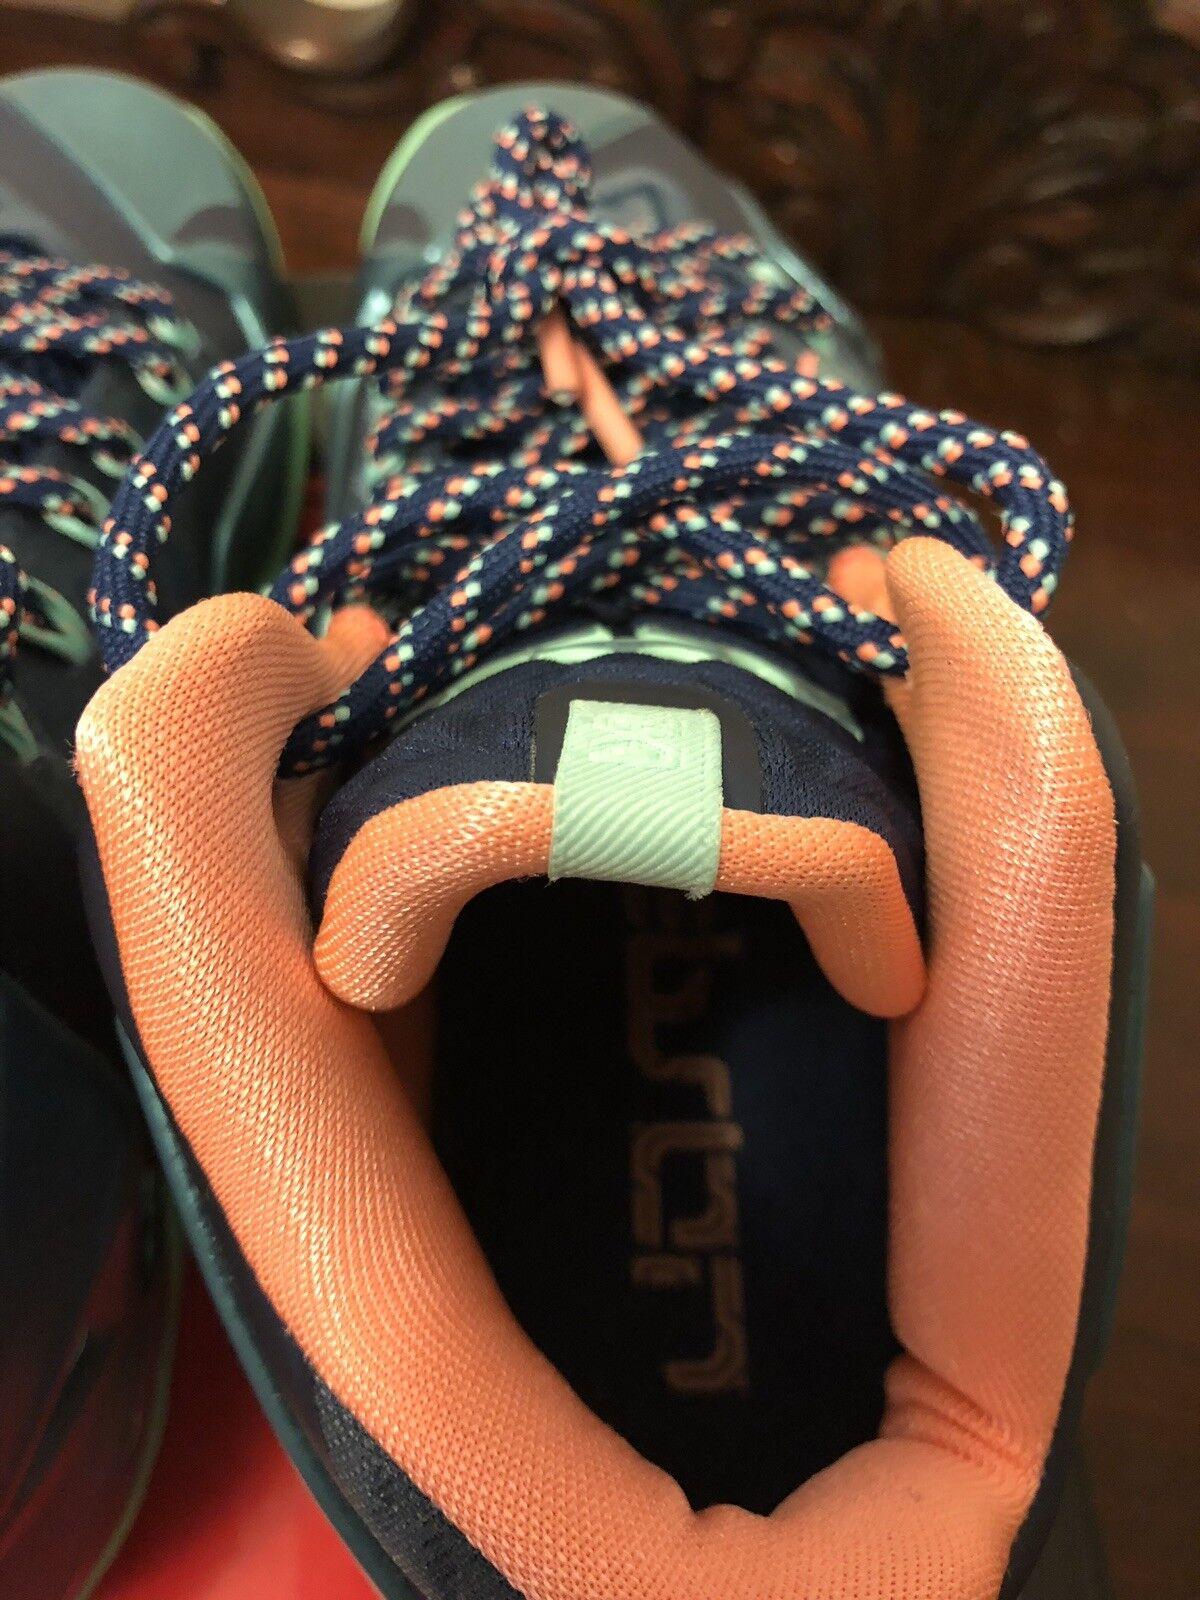 Nike lebron xi magnet gray orange größe größe größe 7 982c39